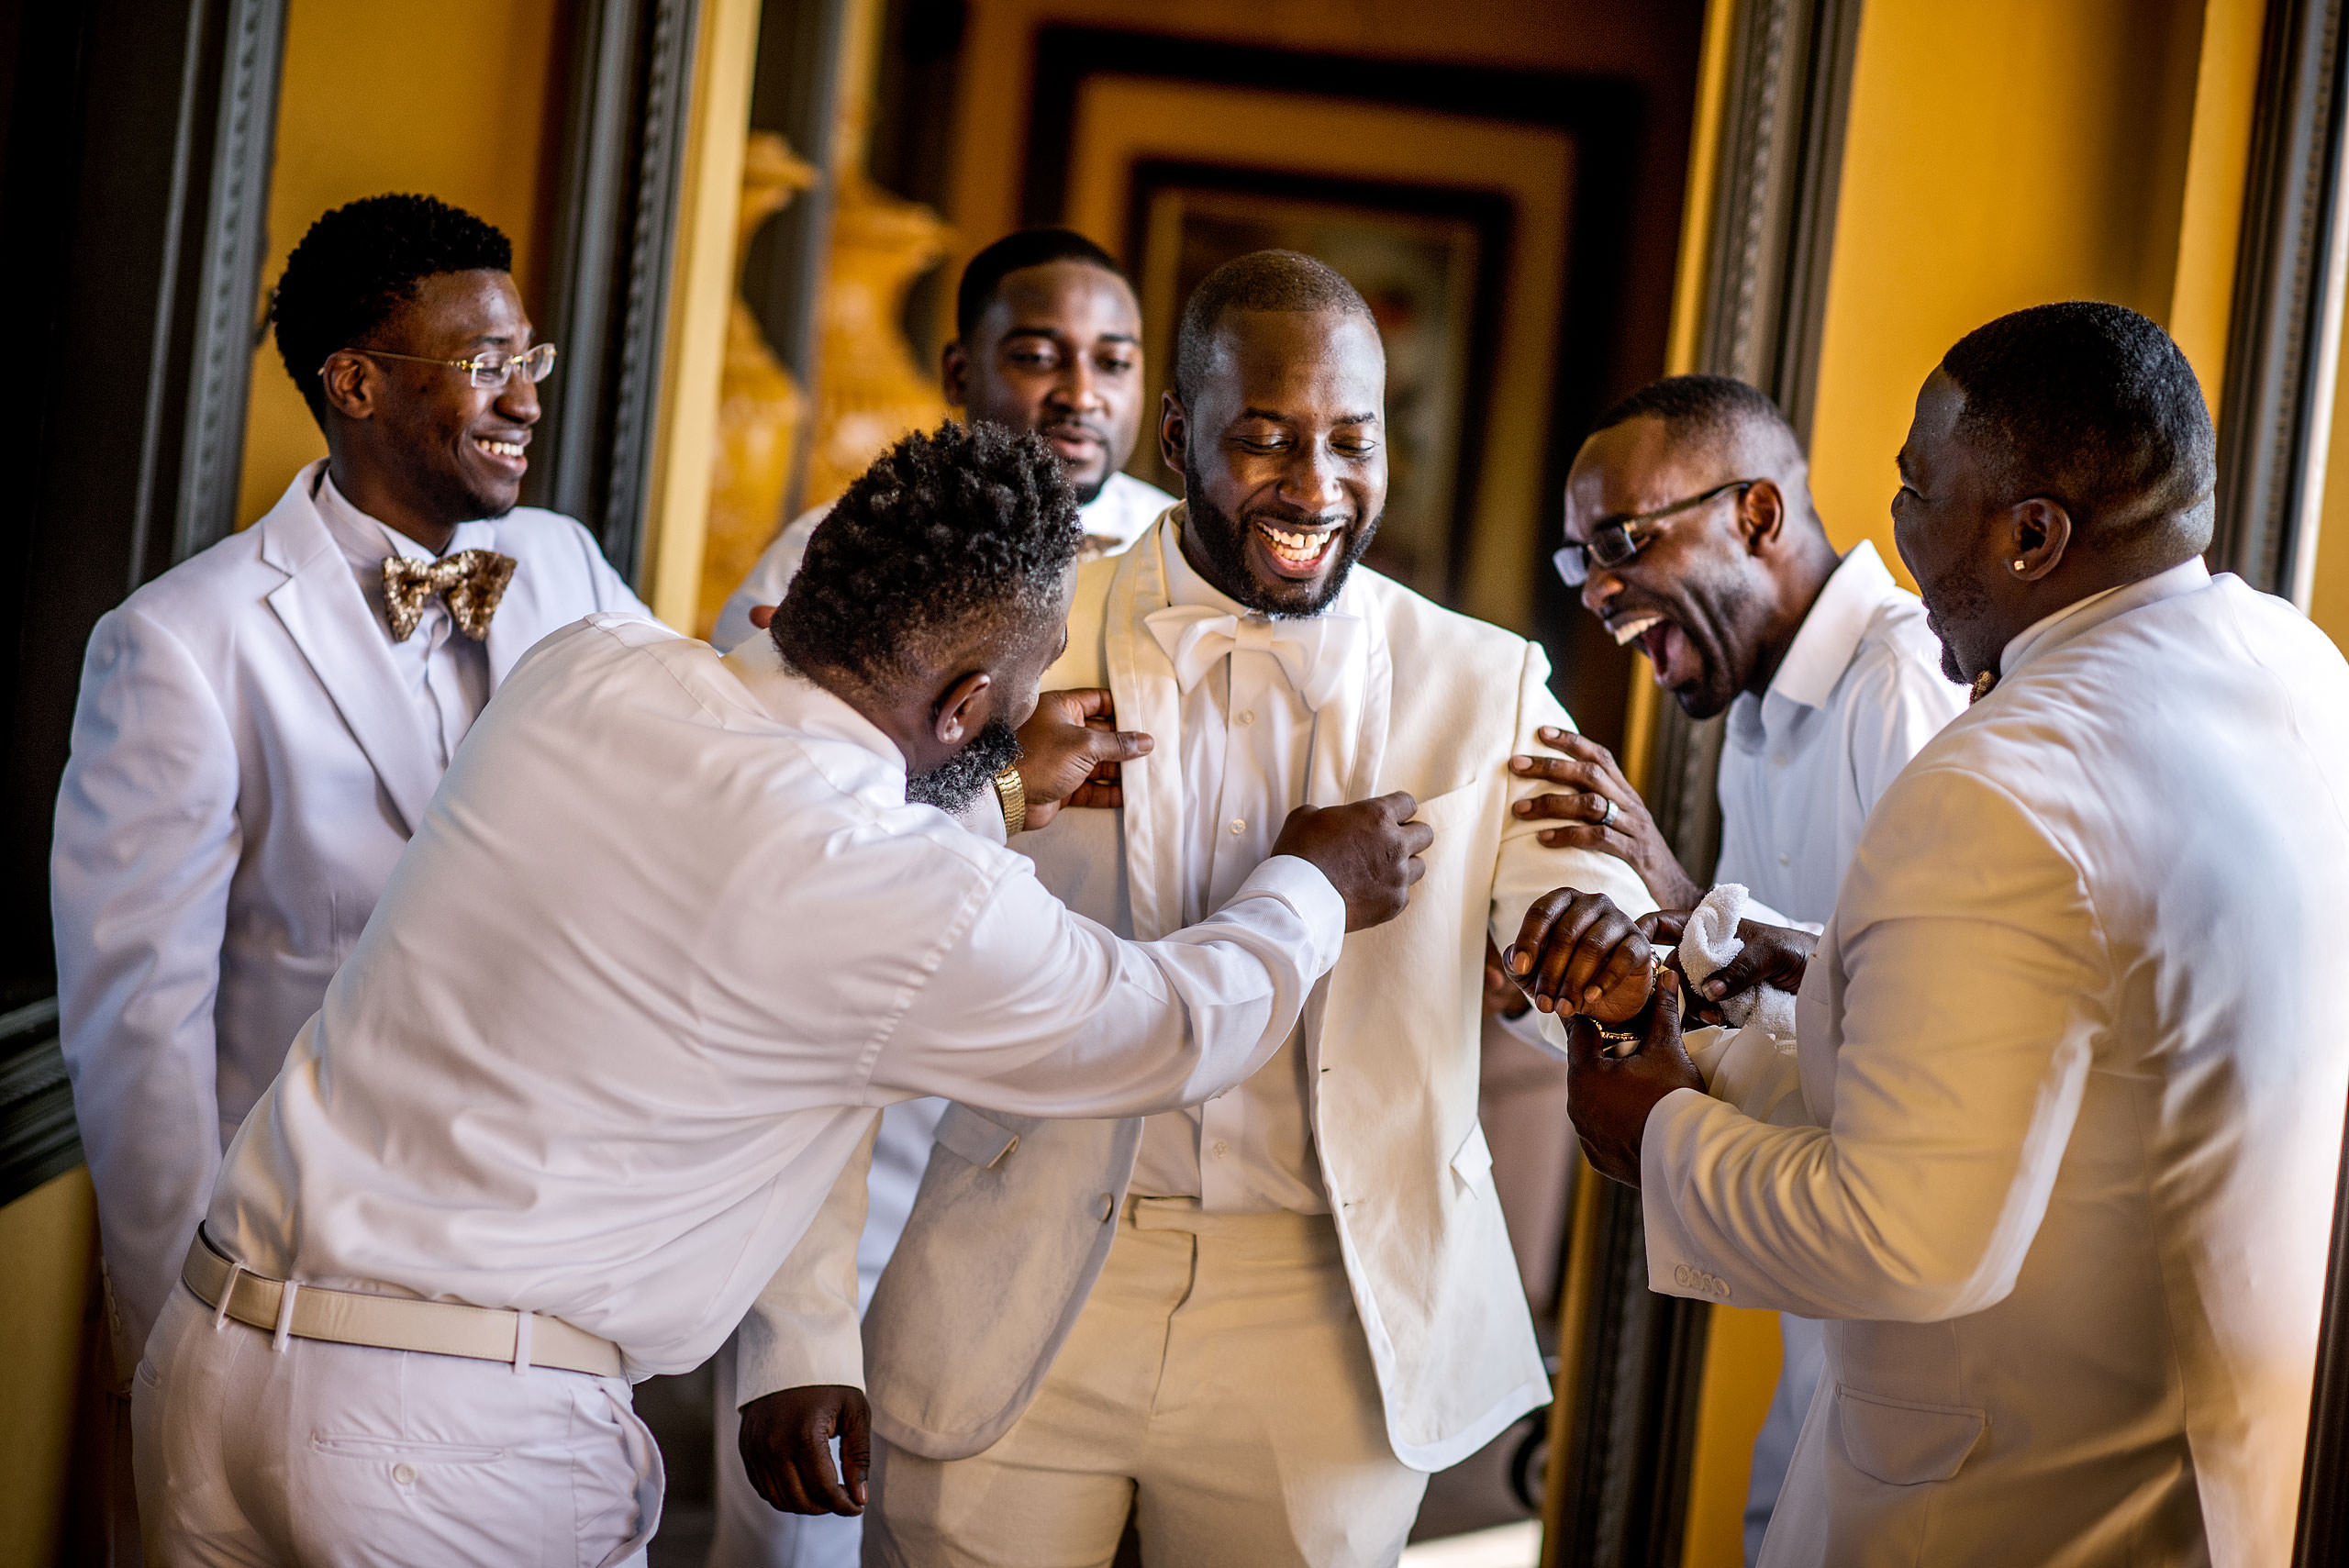 groomsmen joking around while getting ready for a wedding by destination wedding photographer